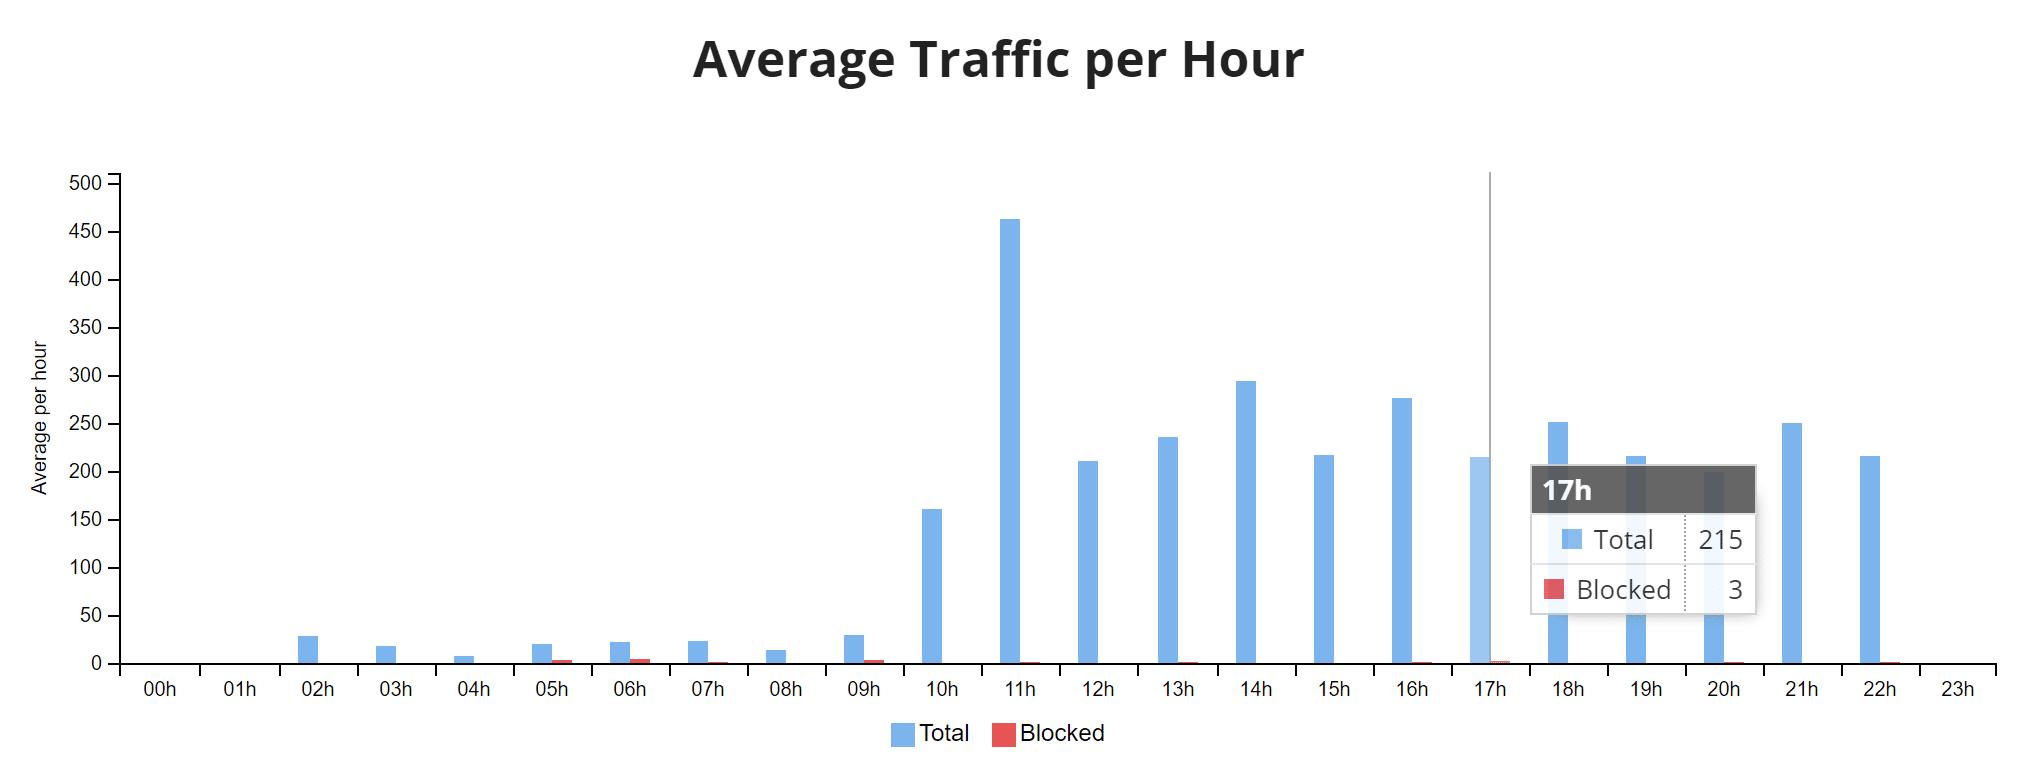 Trafic moyen par heure